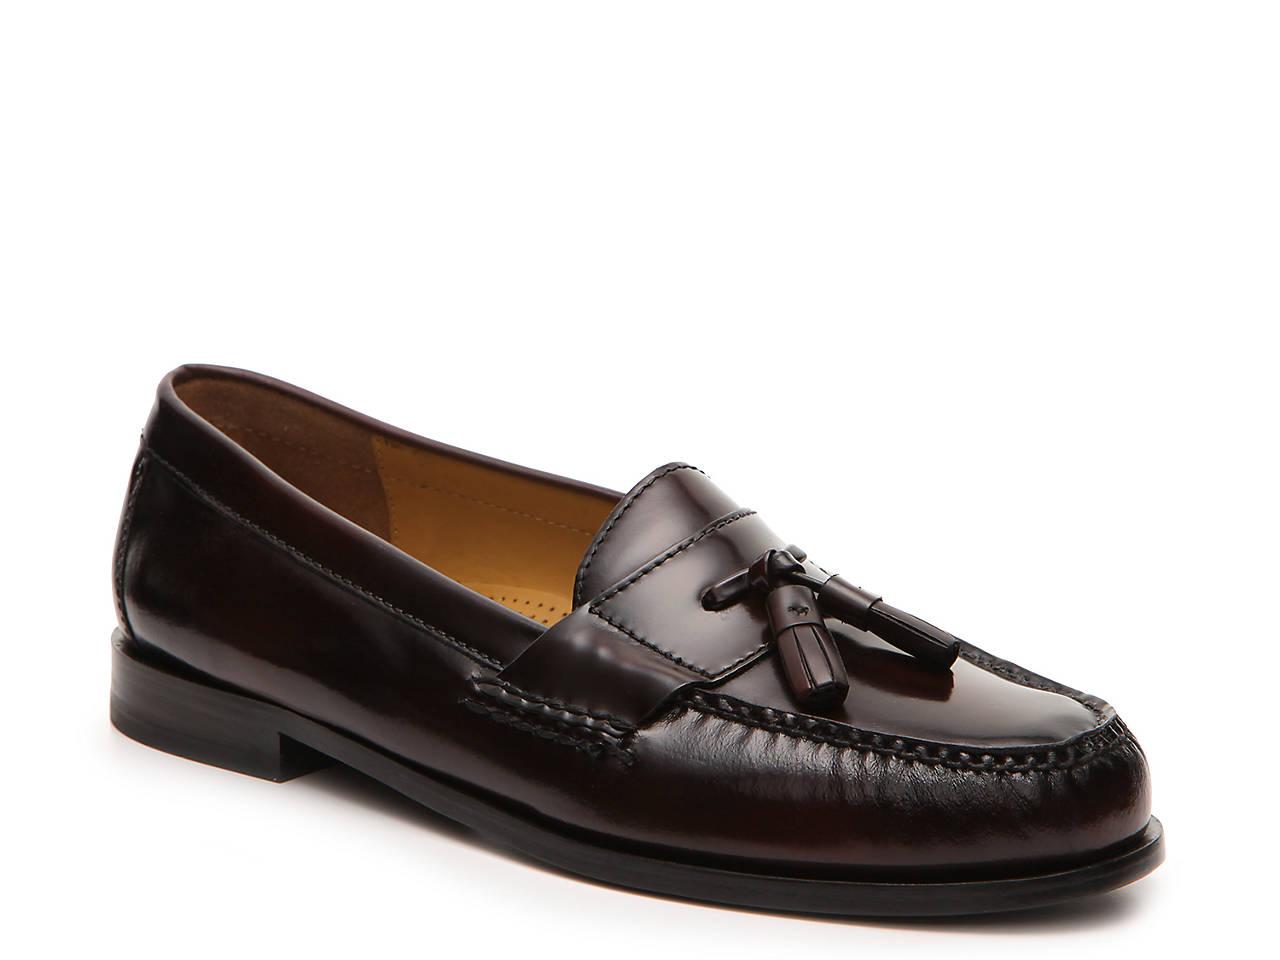 26ffe029ddc Cole Haan Pinch Tassel Loafer Men s Shoes